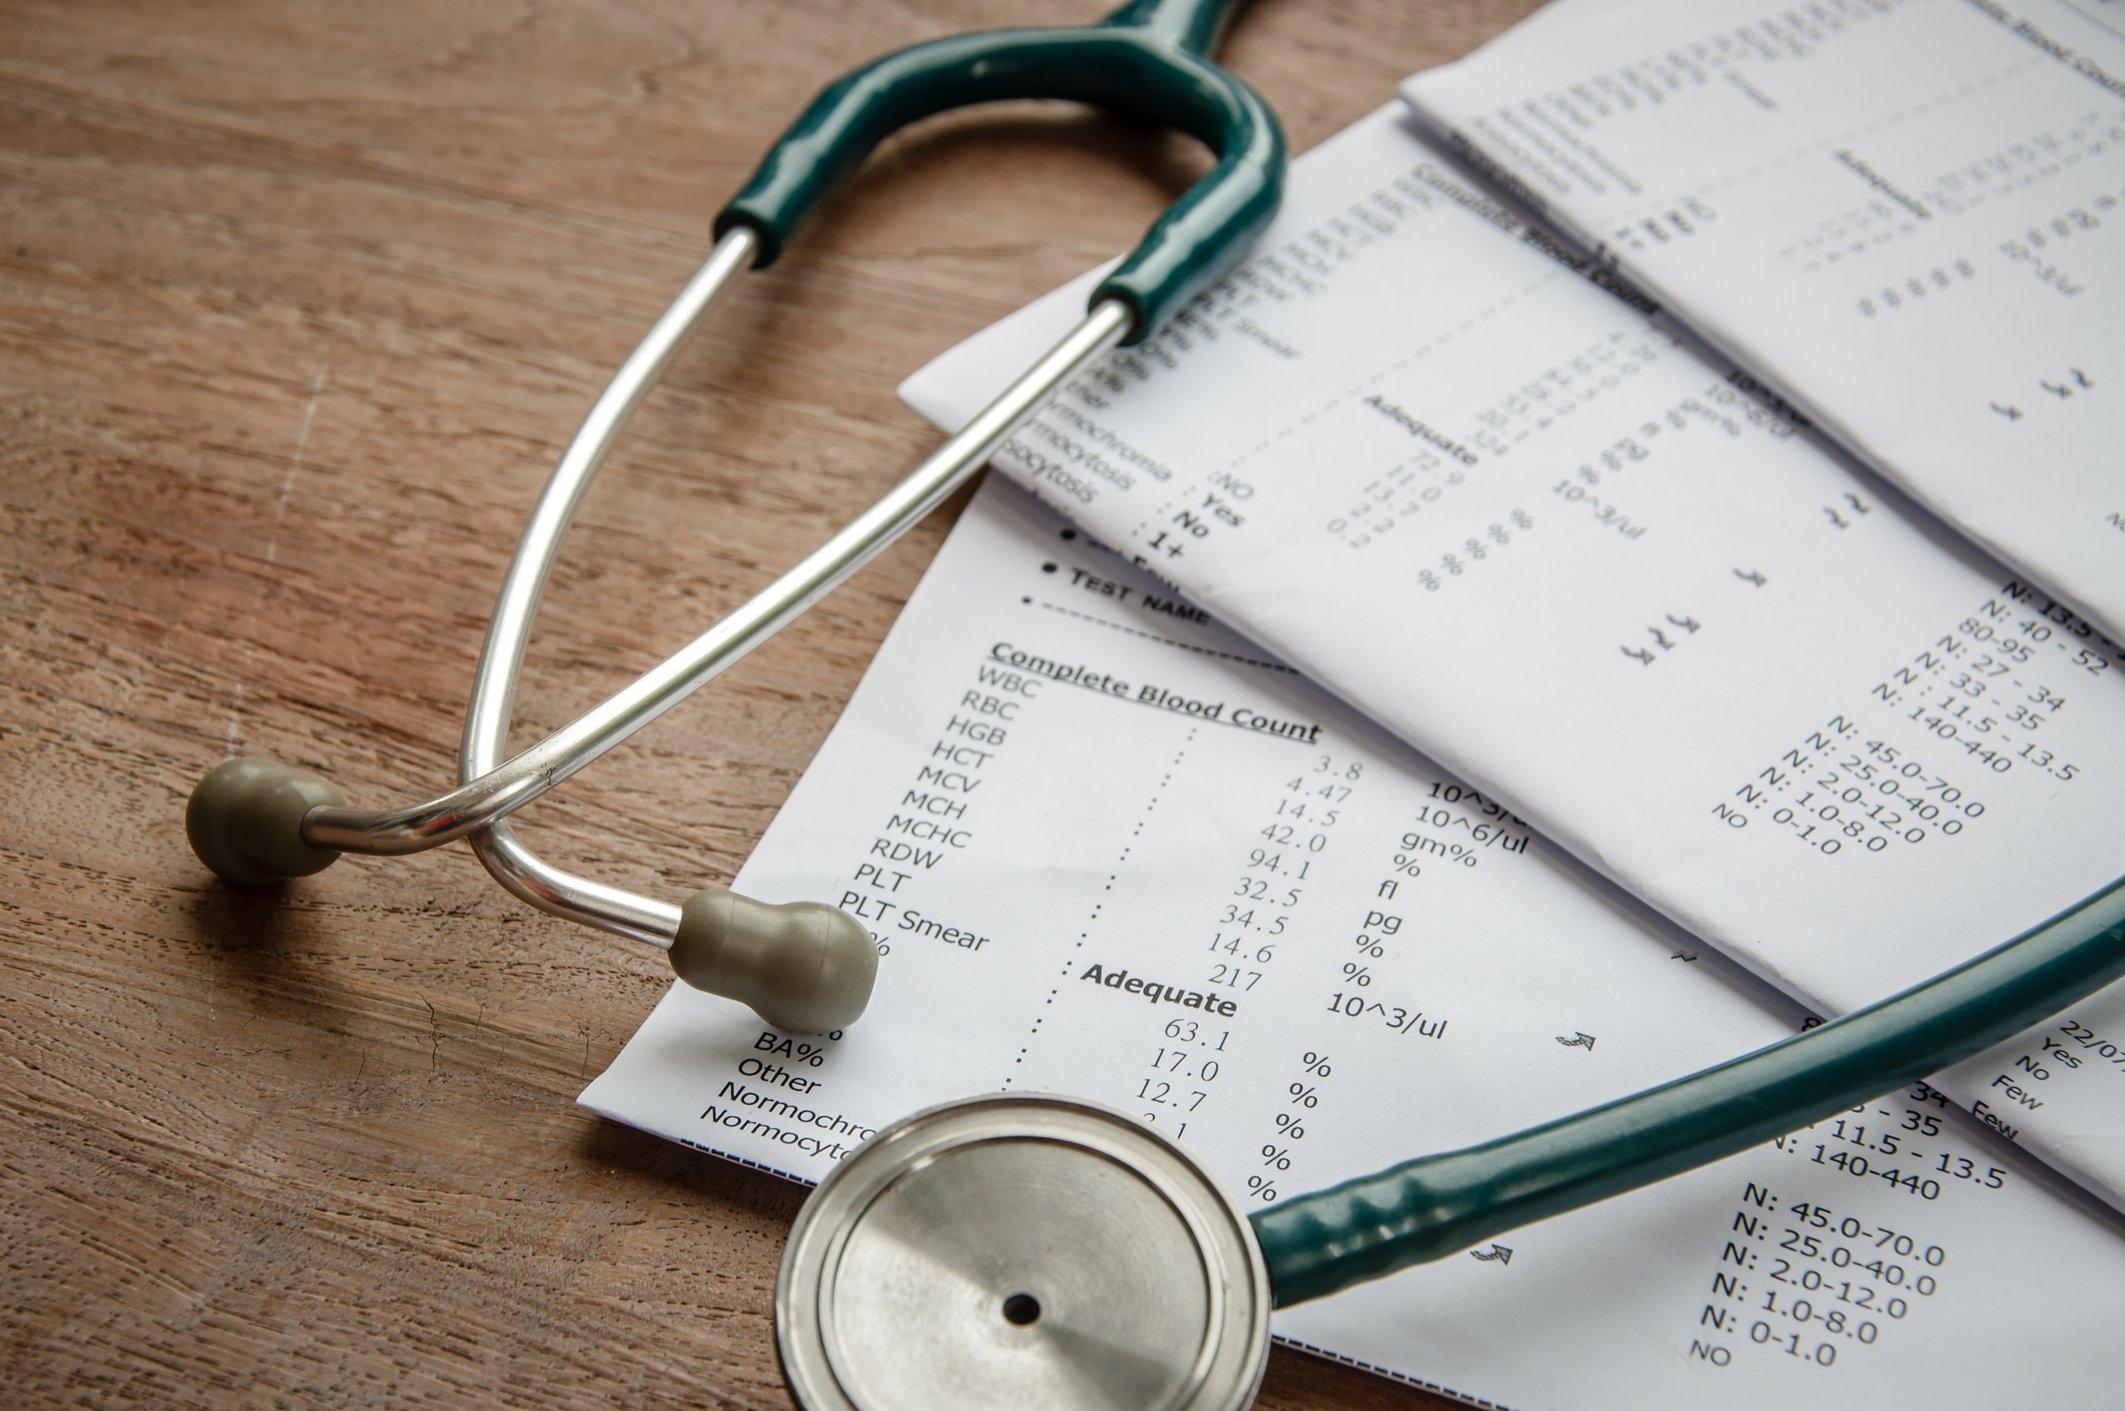 estetoscópio e resultado de laboratório, conceito de seguro médico.